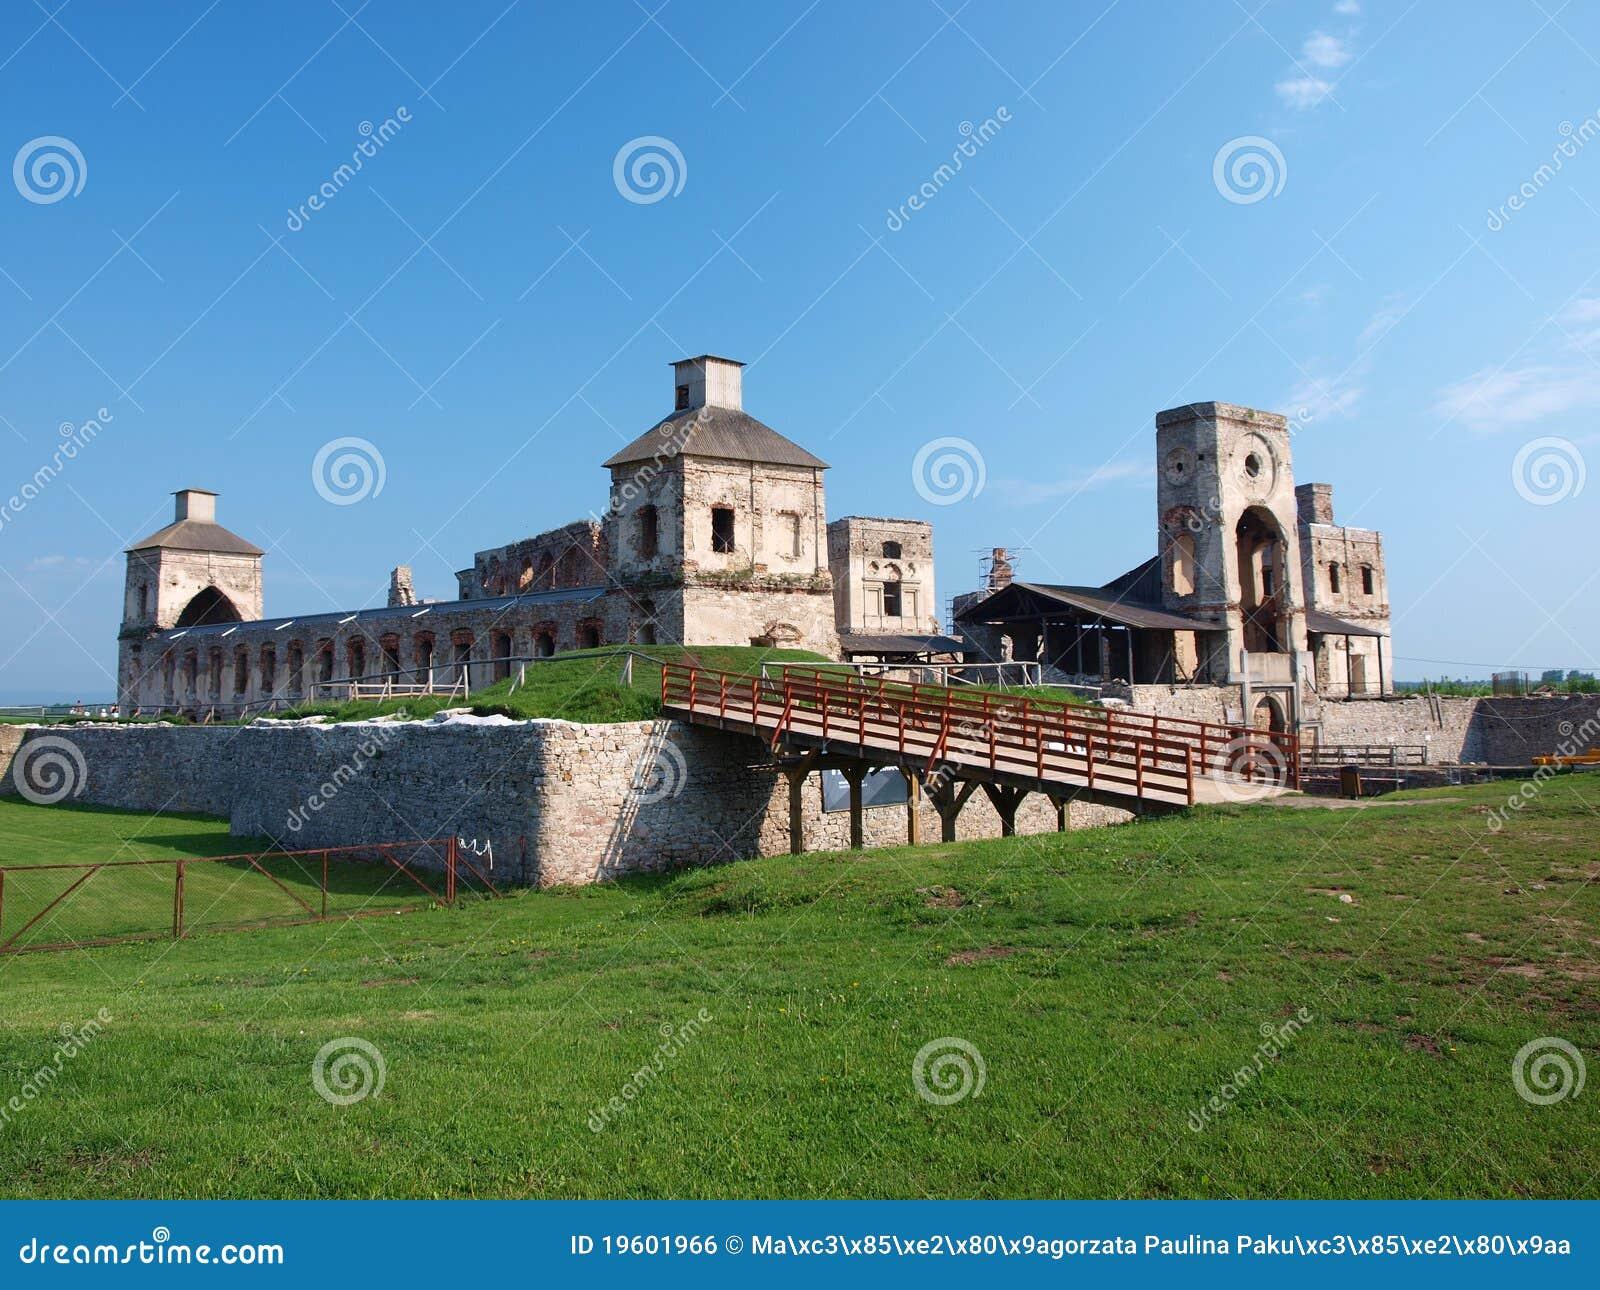 Krzyztopor castle, Ujazd, Poland